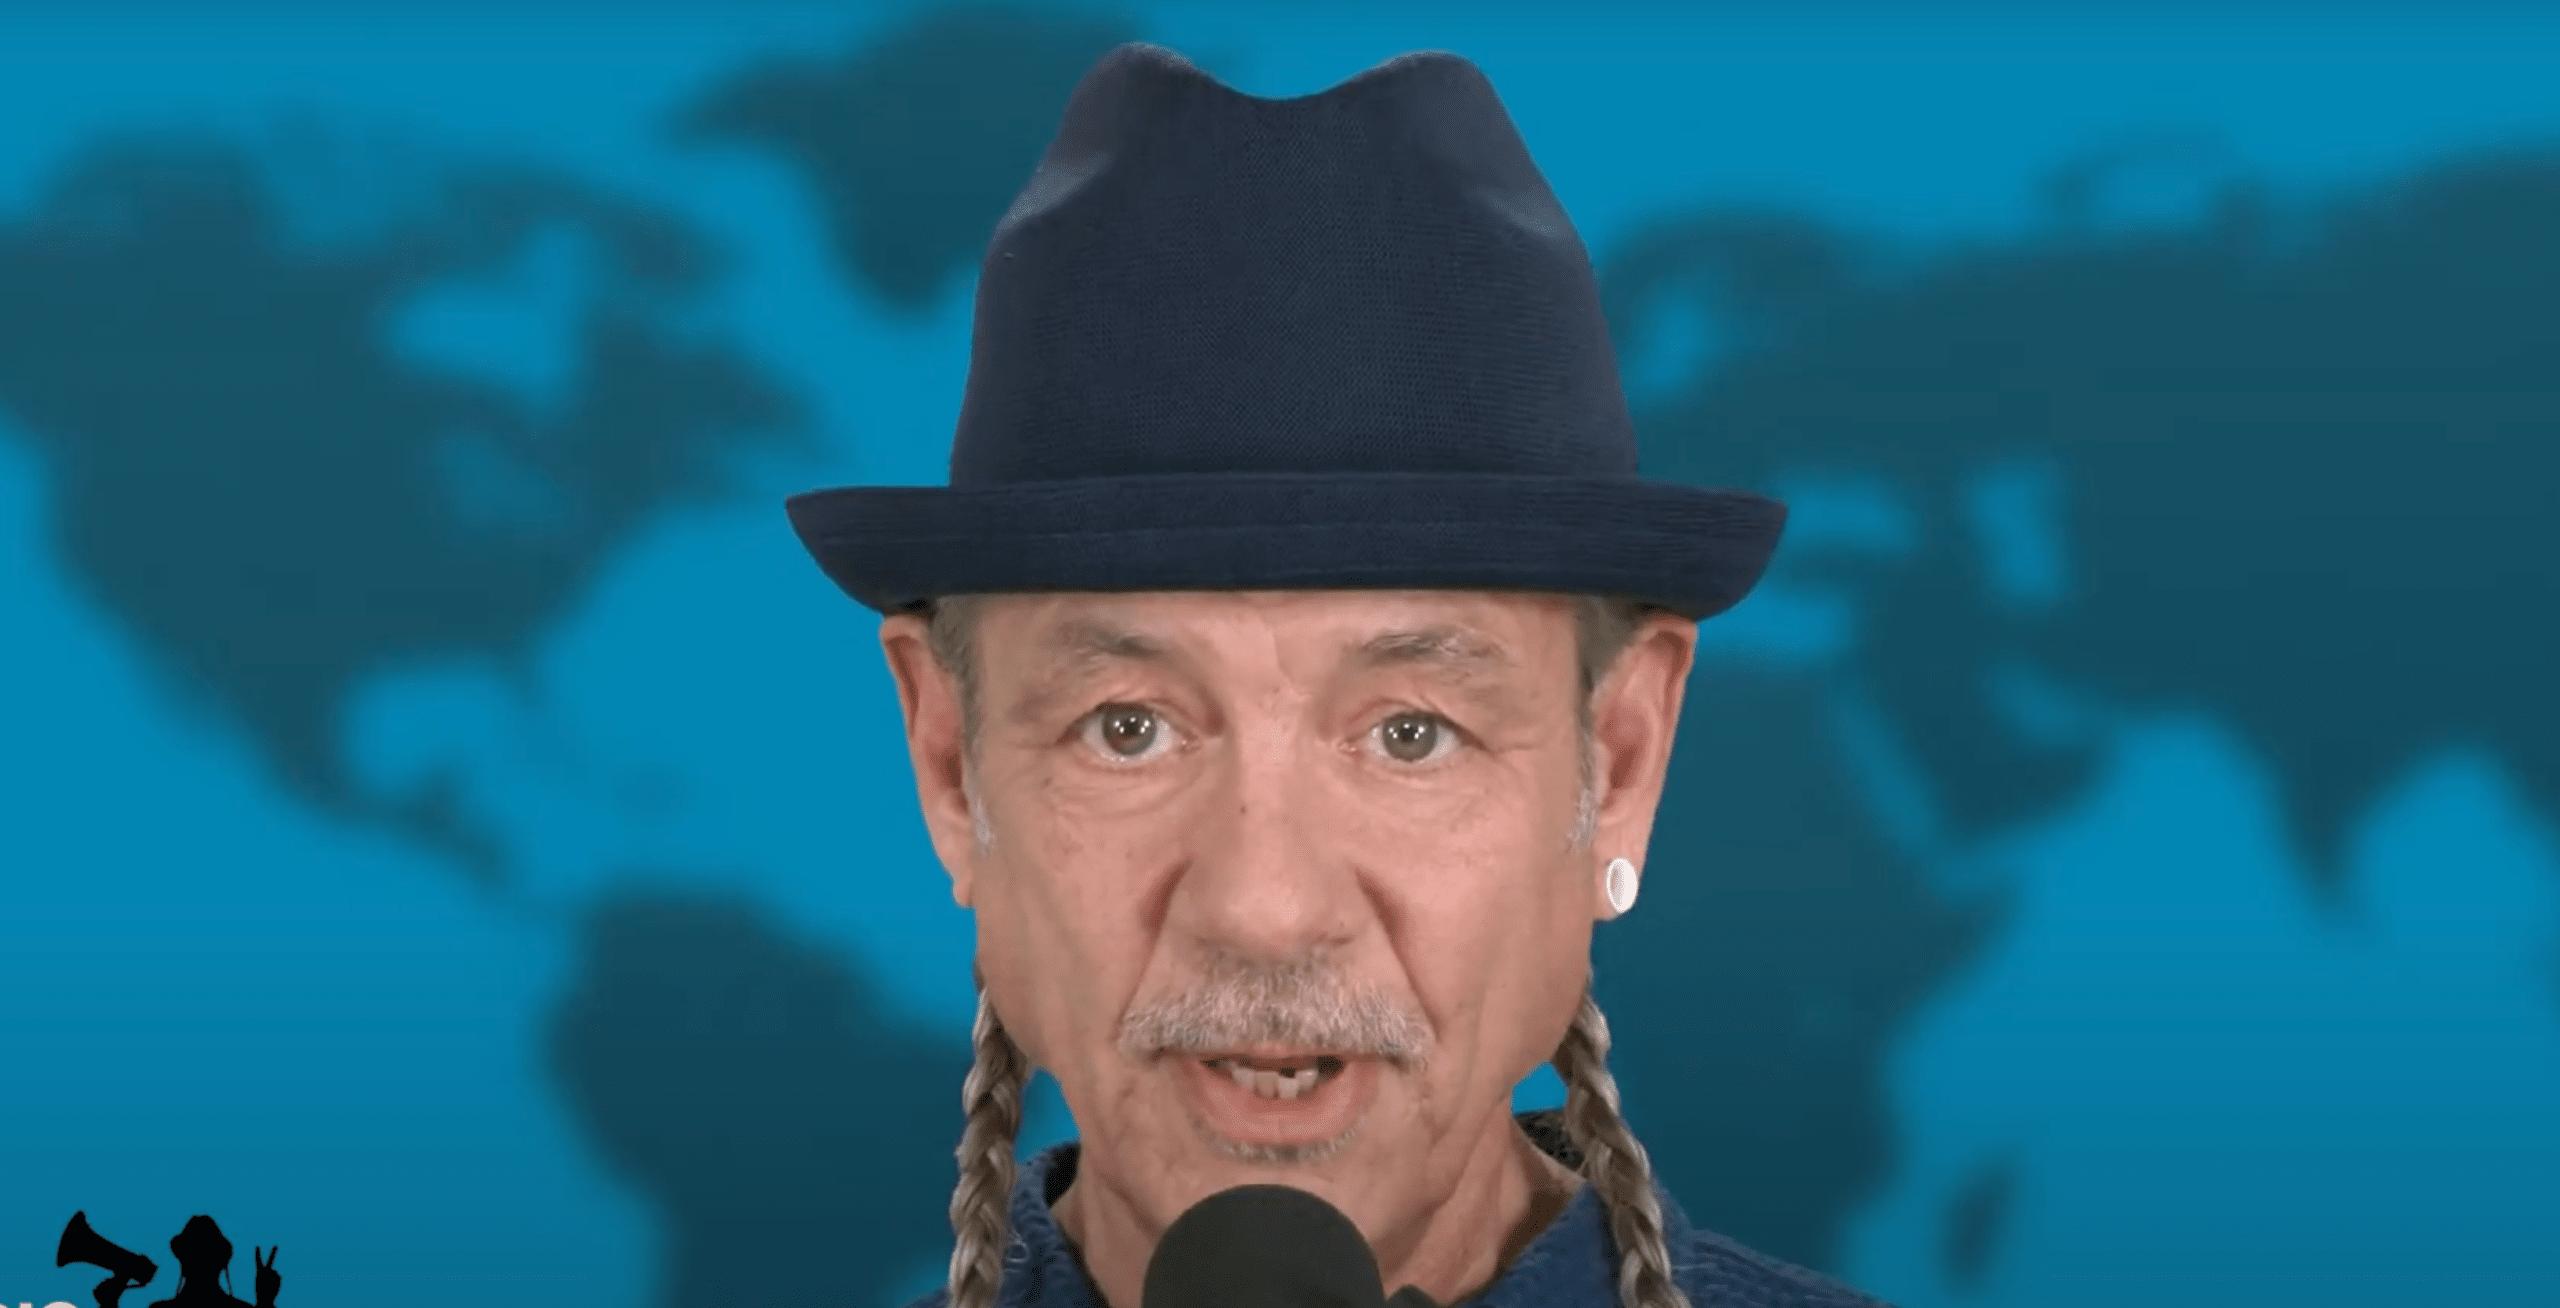 Steve Deangelo sobre el encarcelamiento de Albert Tió